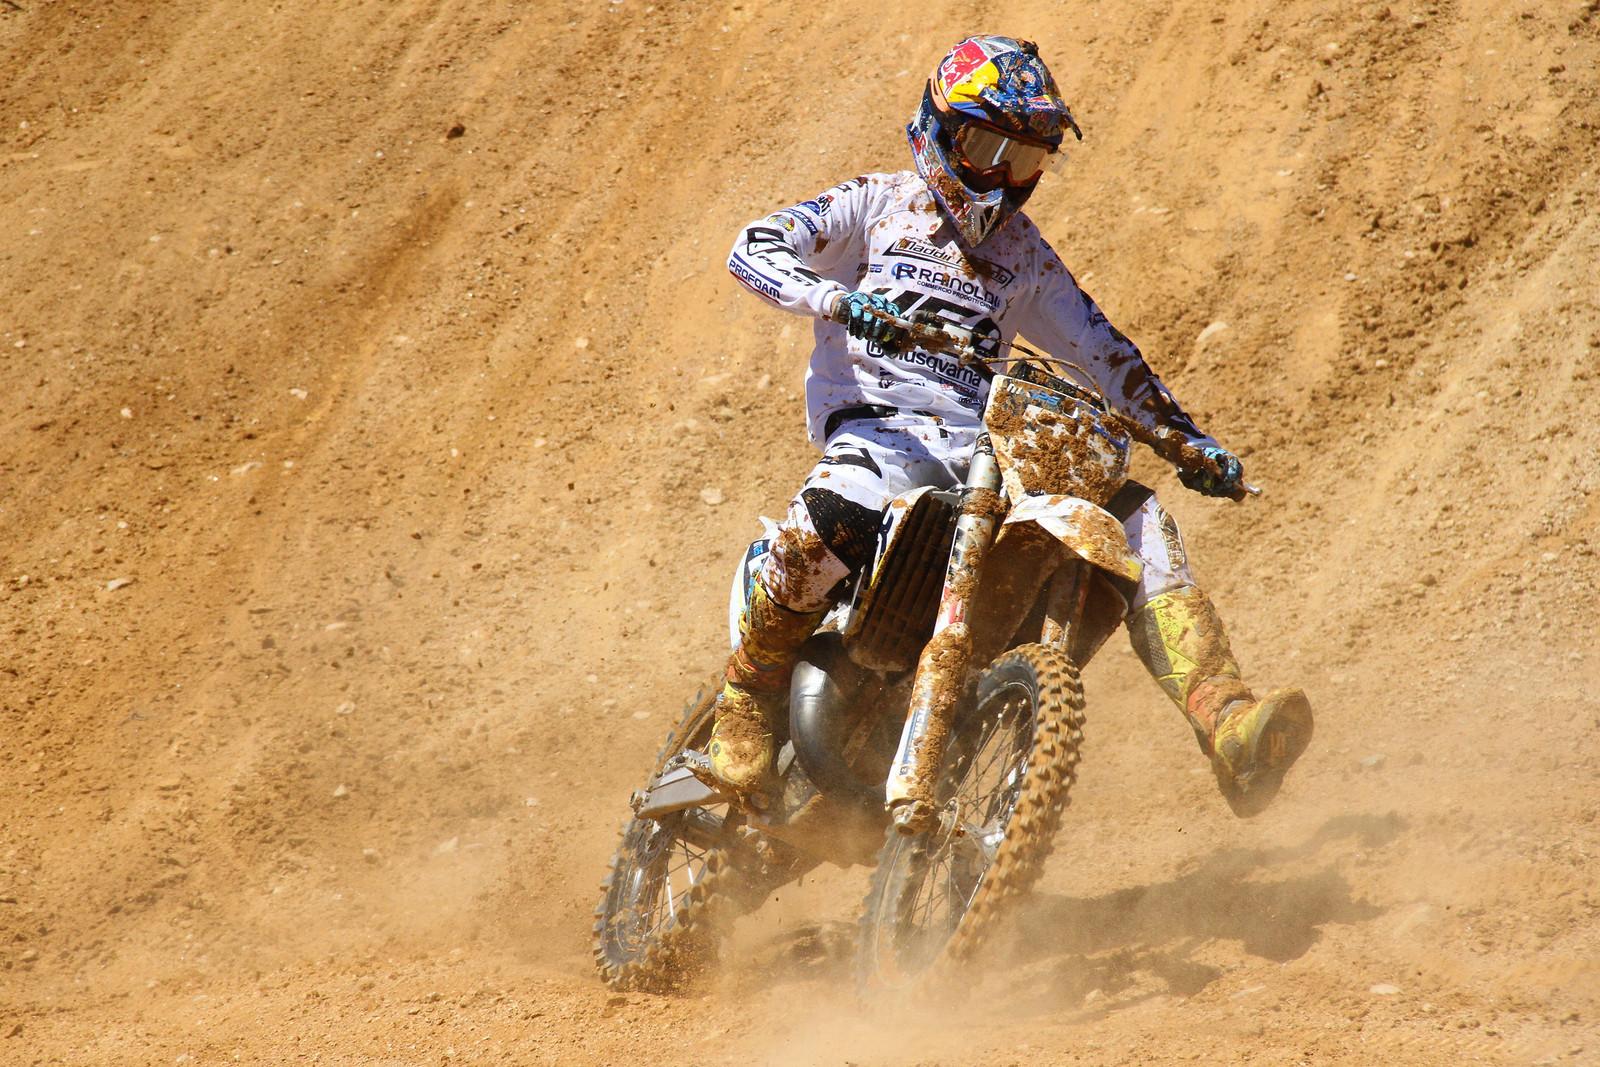 Gianluca Facchetti - ayearinmx - Motocross Pictures - Vital MX